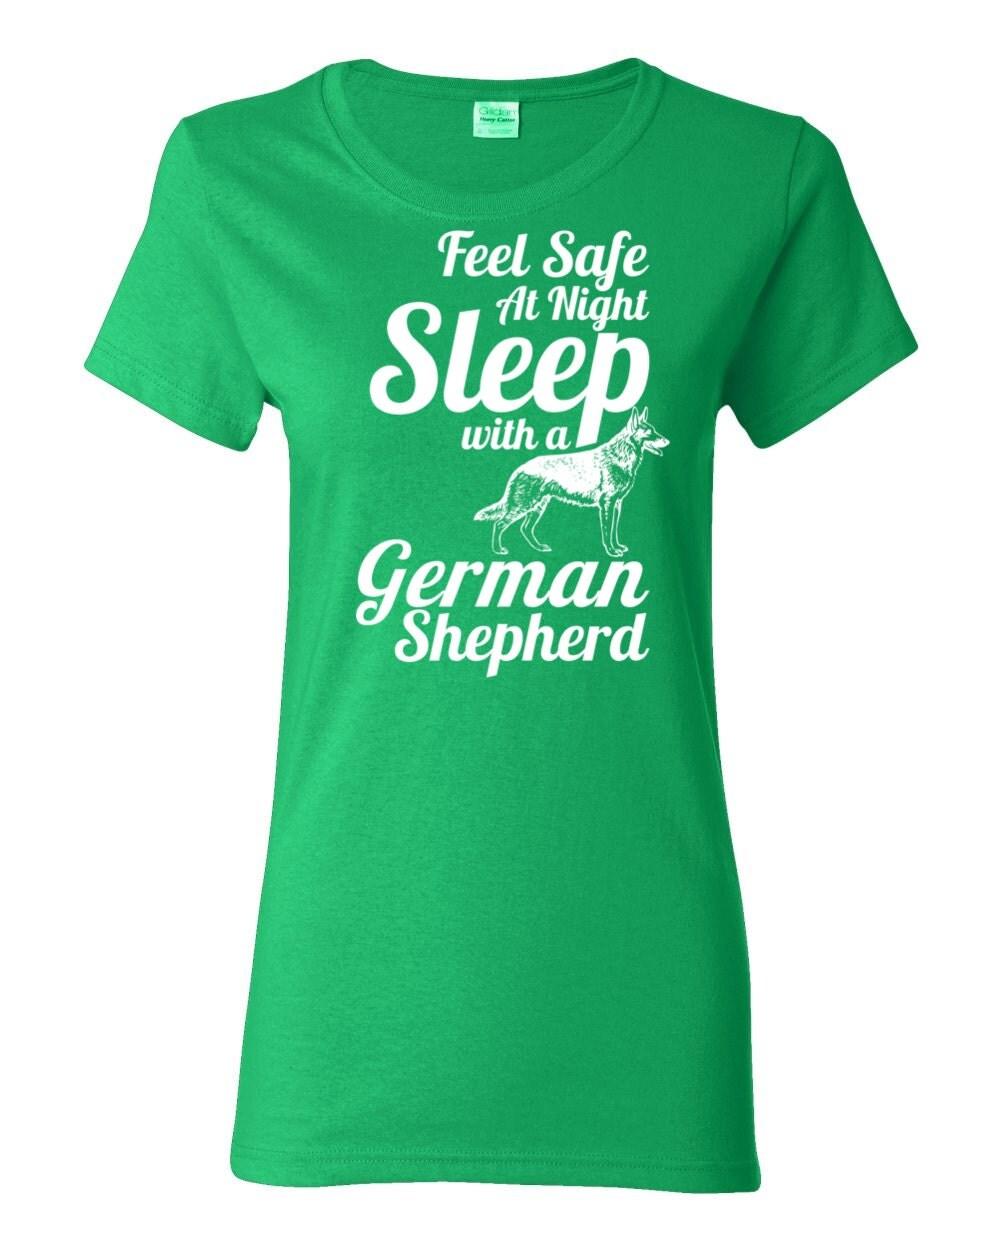 German Shepherd T-shirt - Feel Safe at Night Sleep With a German Shepherd Womens T-shirt - My Dog German Shepherd T-shirt